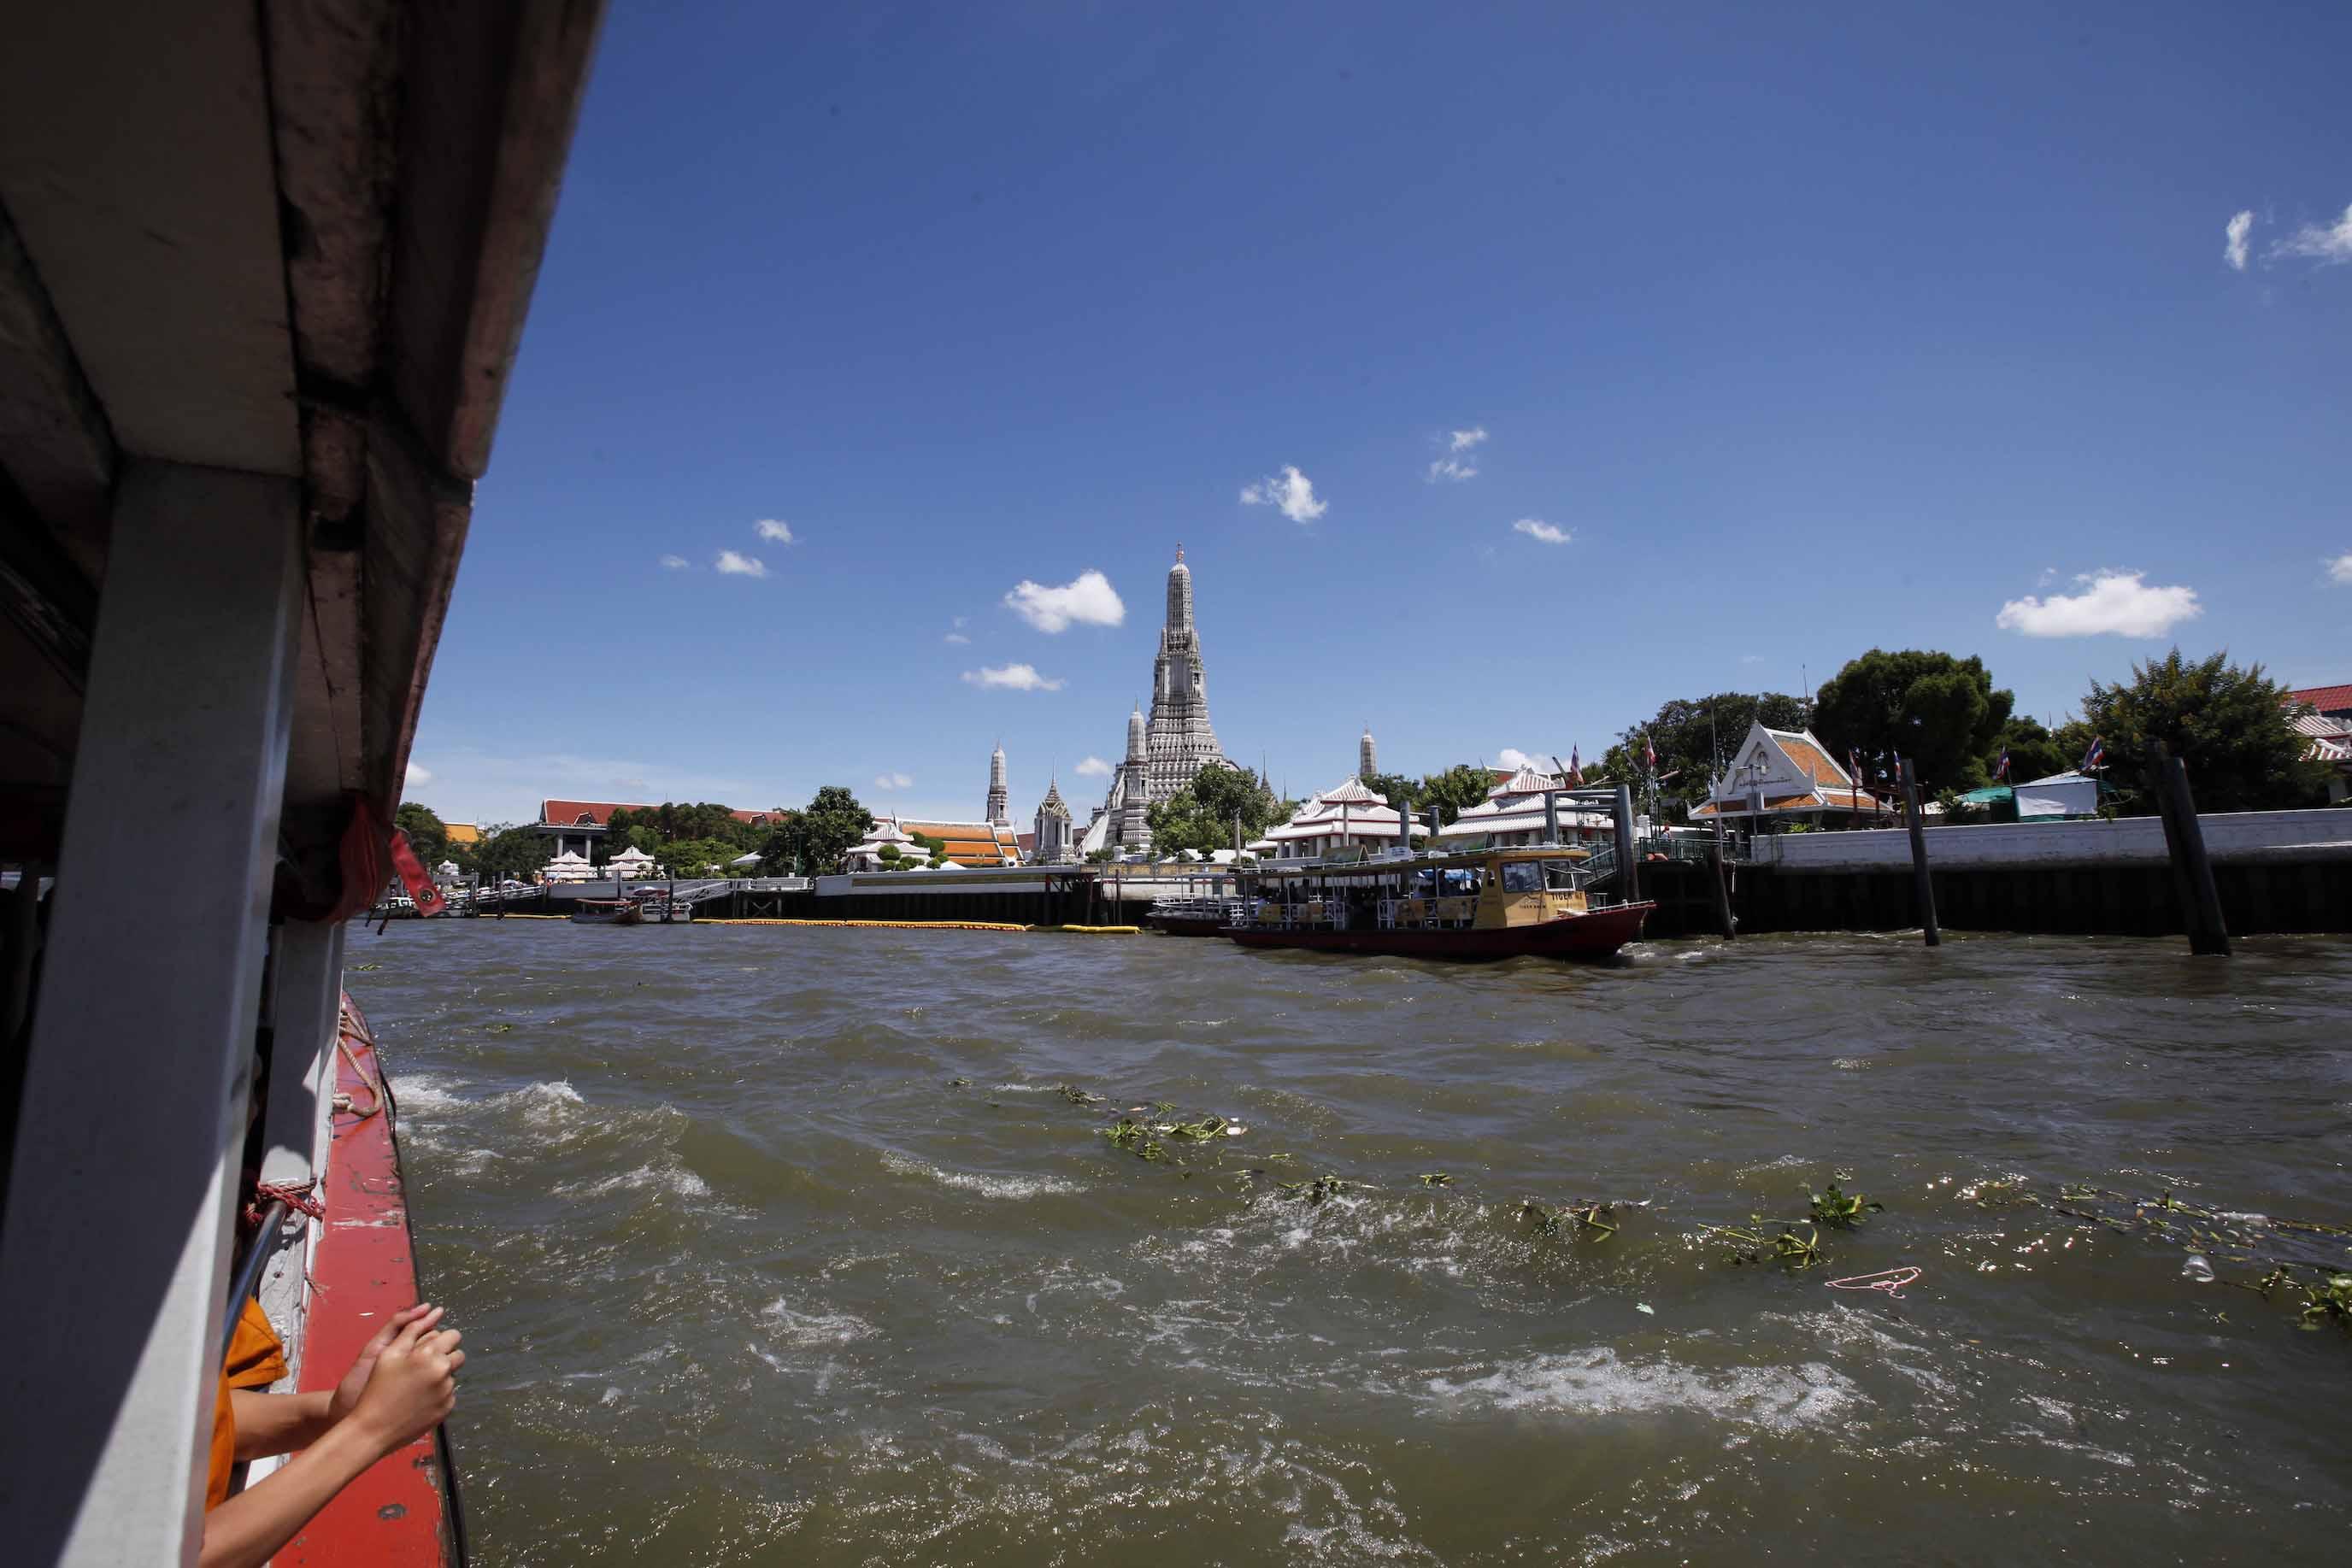 http://www.ohhappybear.com/wp-content/uploads/2019/09/Long-Weekend-Guide-to-Bangkok-805x537.jpg